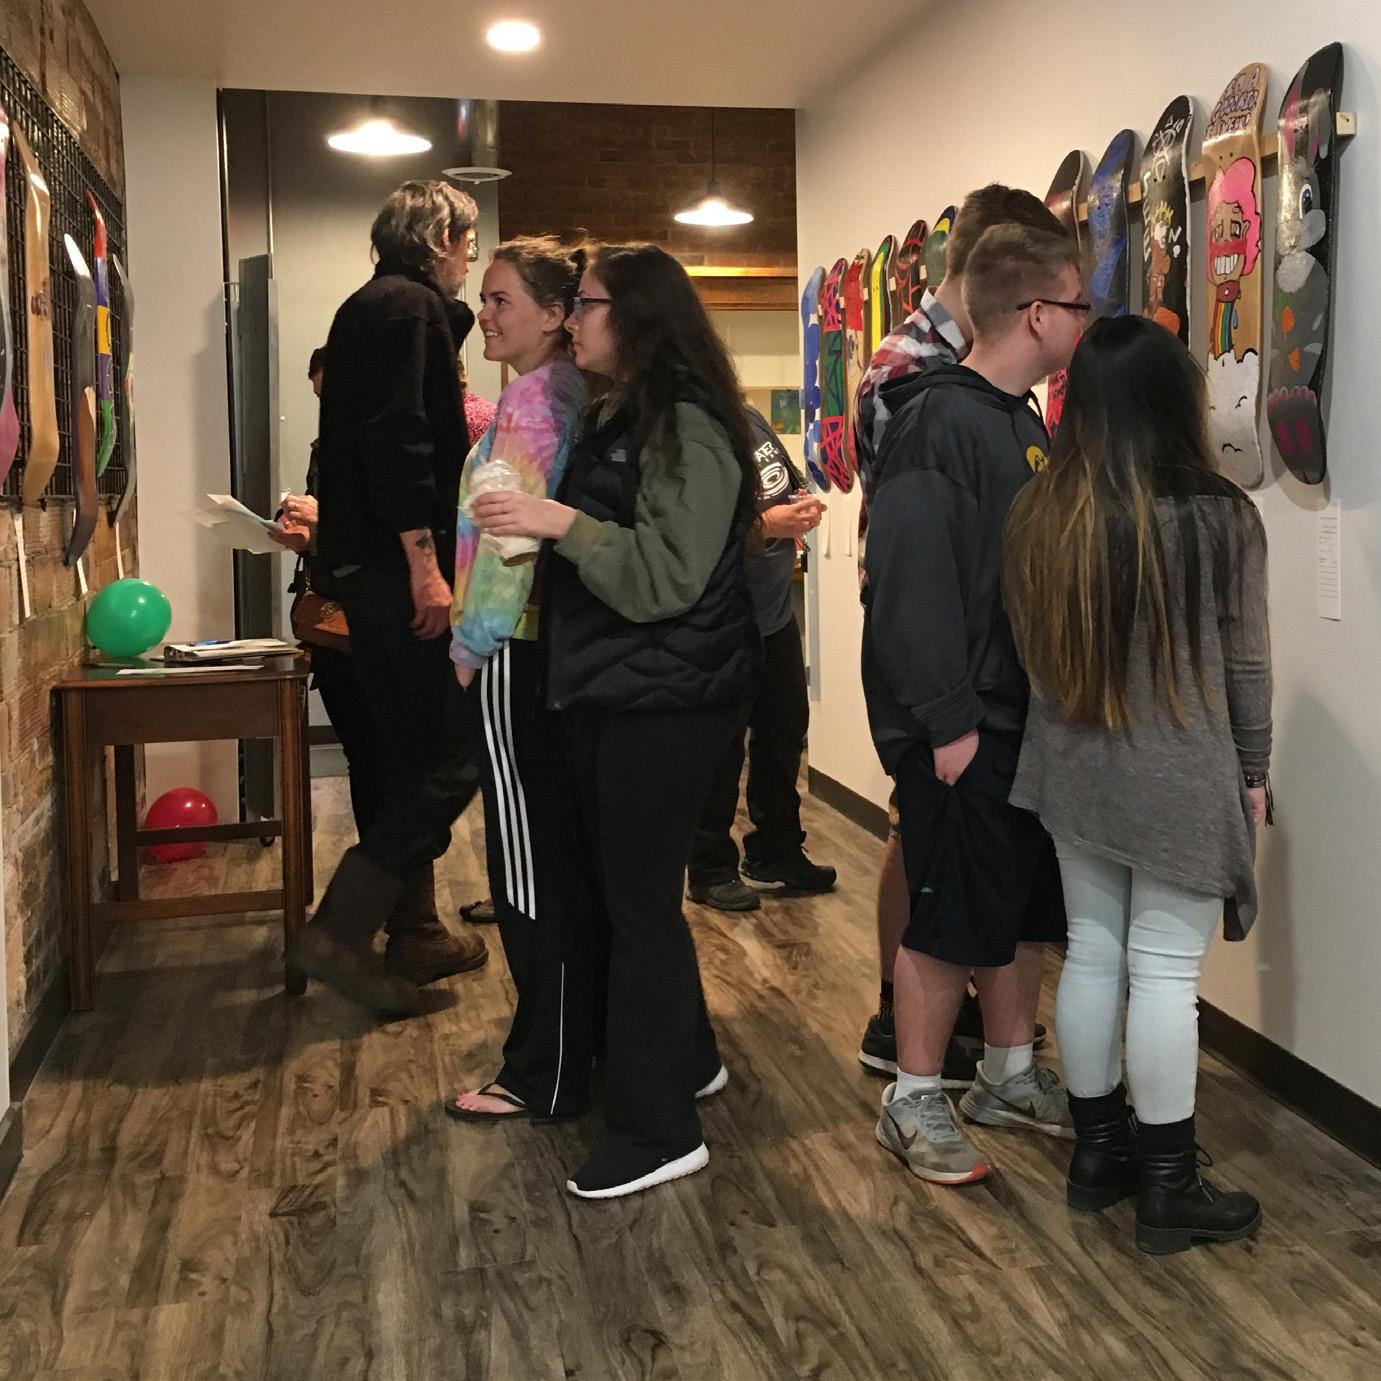 A gallery show at the Oskaloosa Art Center and Studios. Photo by Sarah Kargol